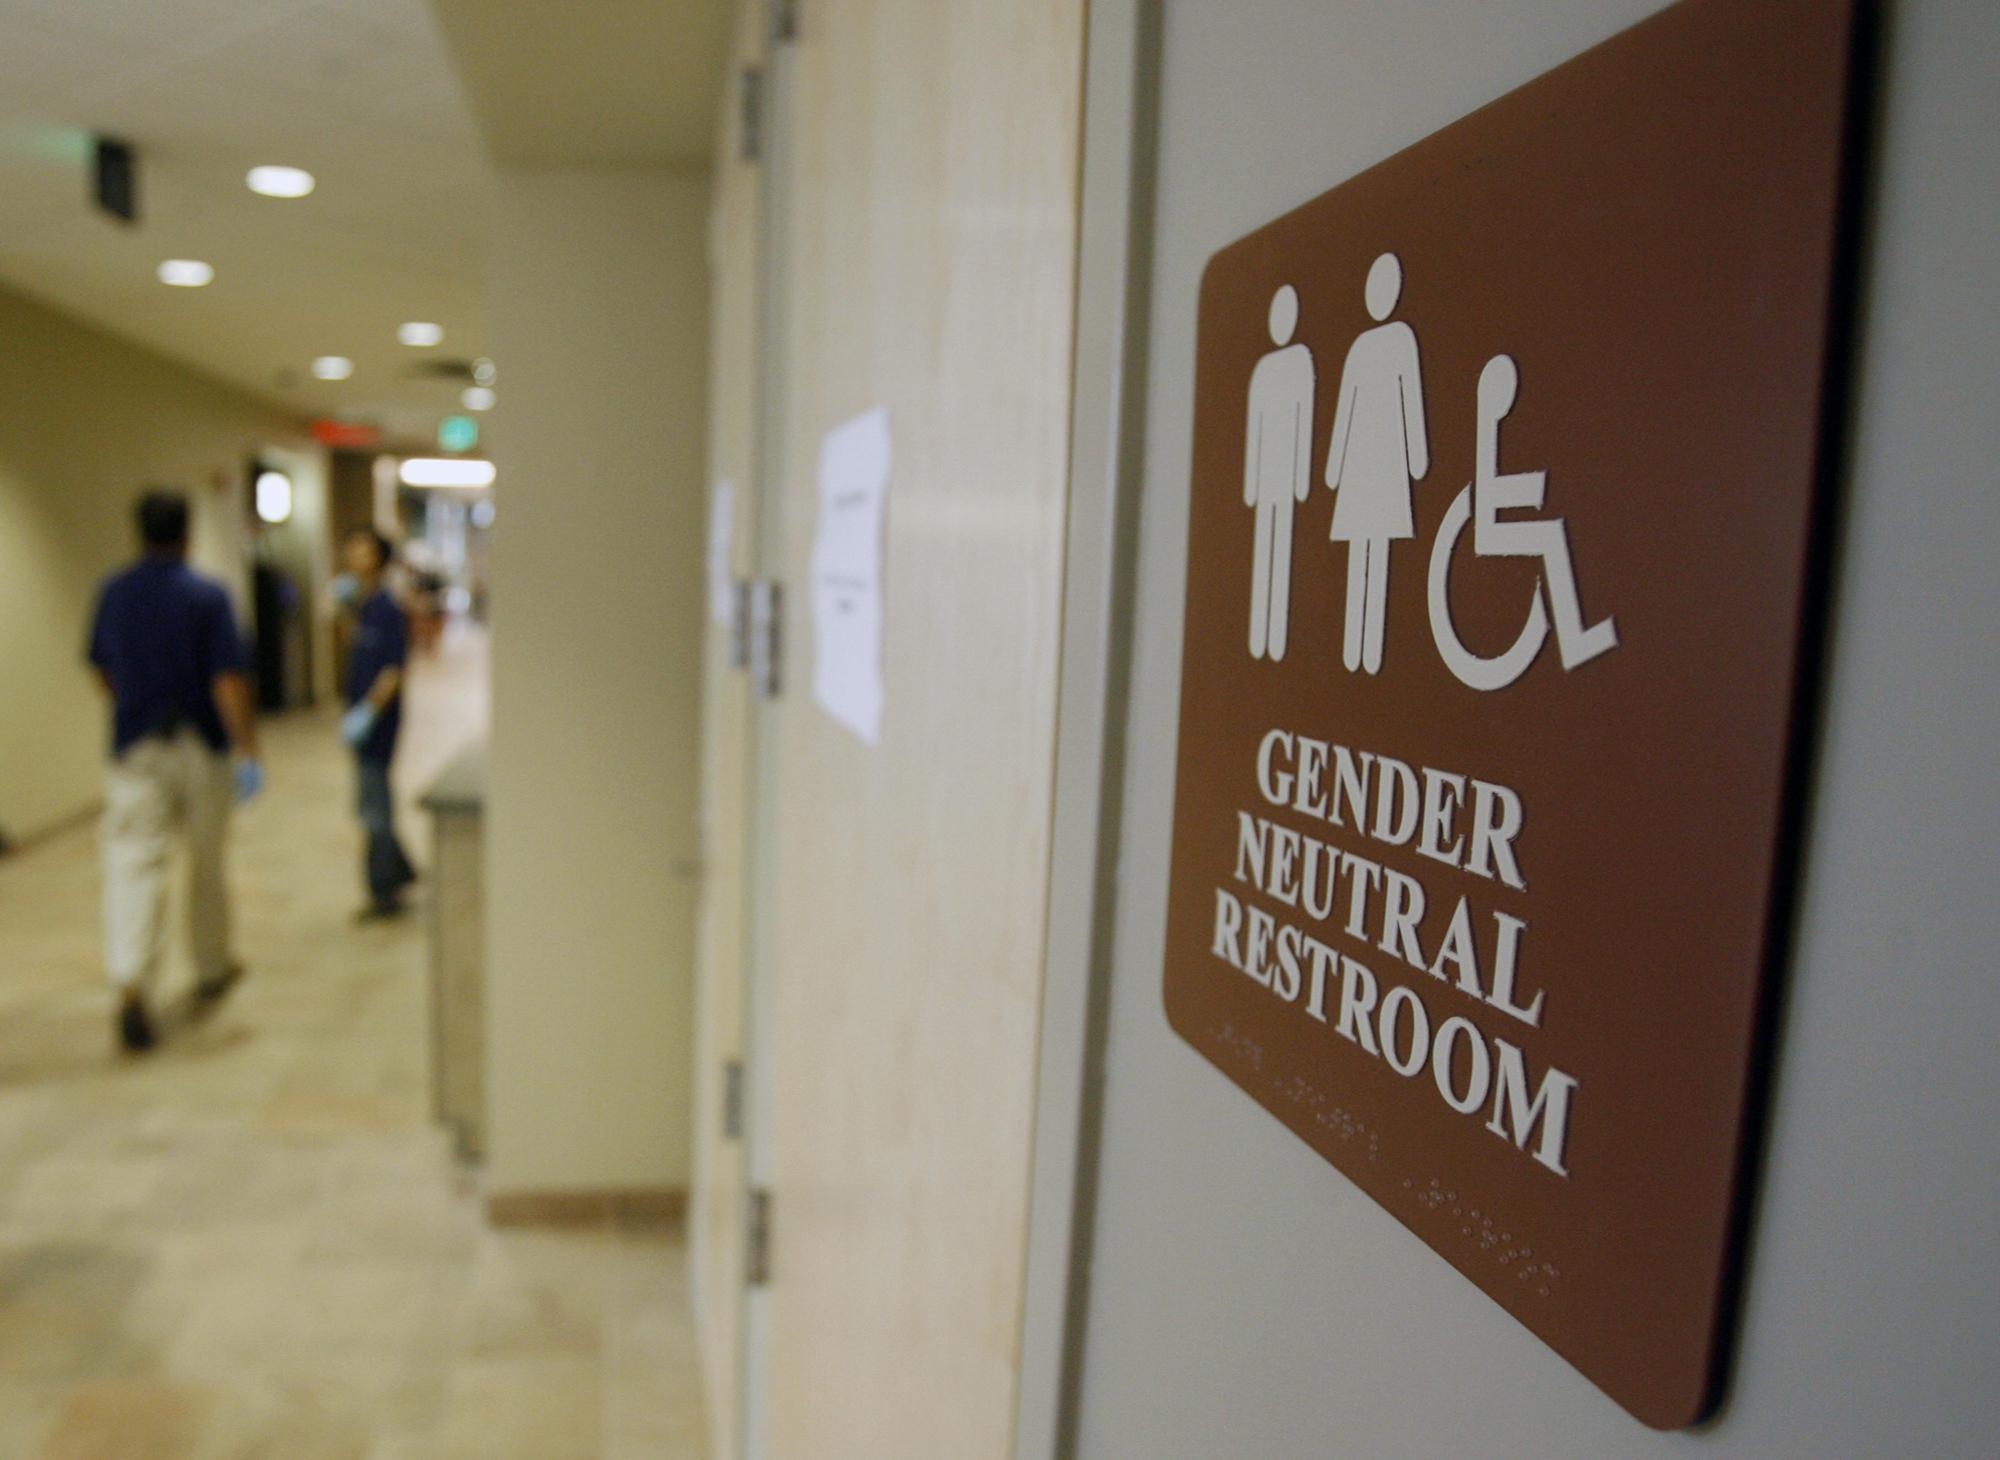 cbs/nyt poll: americans divided over transgender bathroom laws